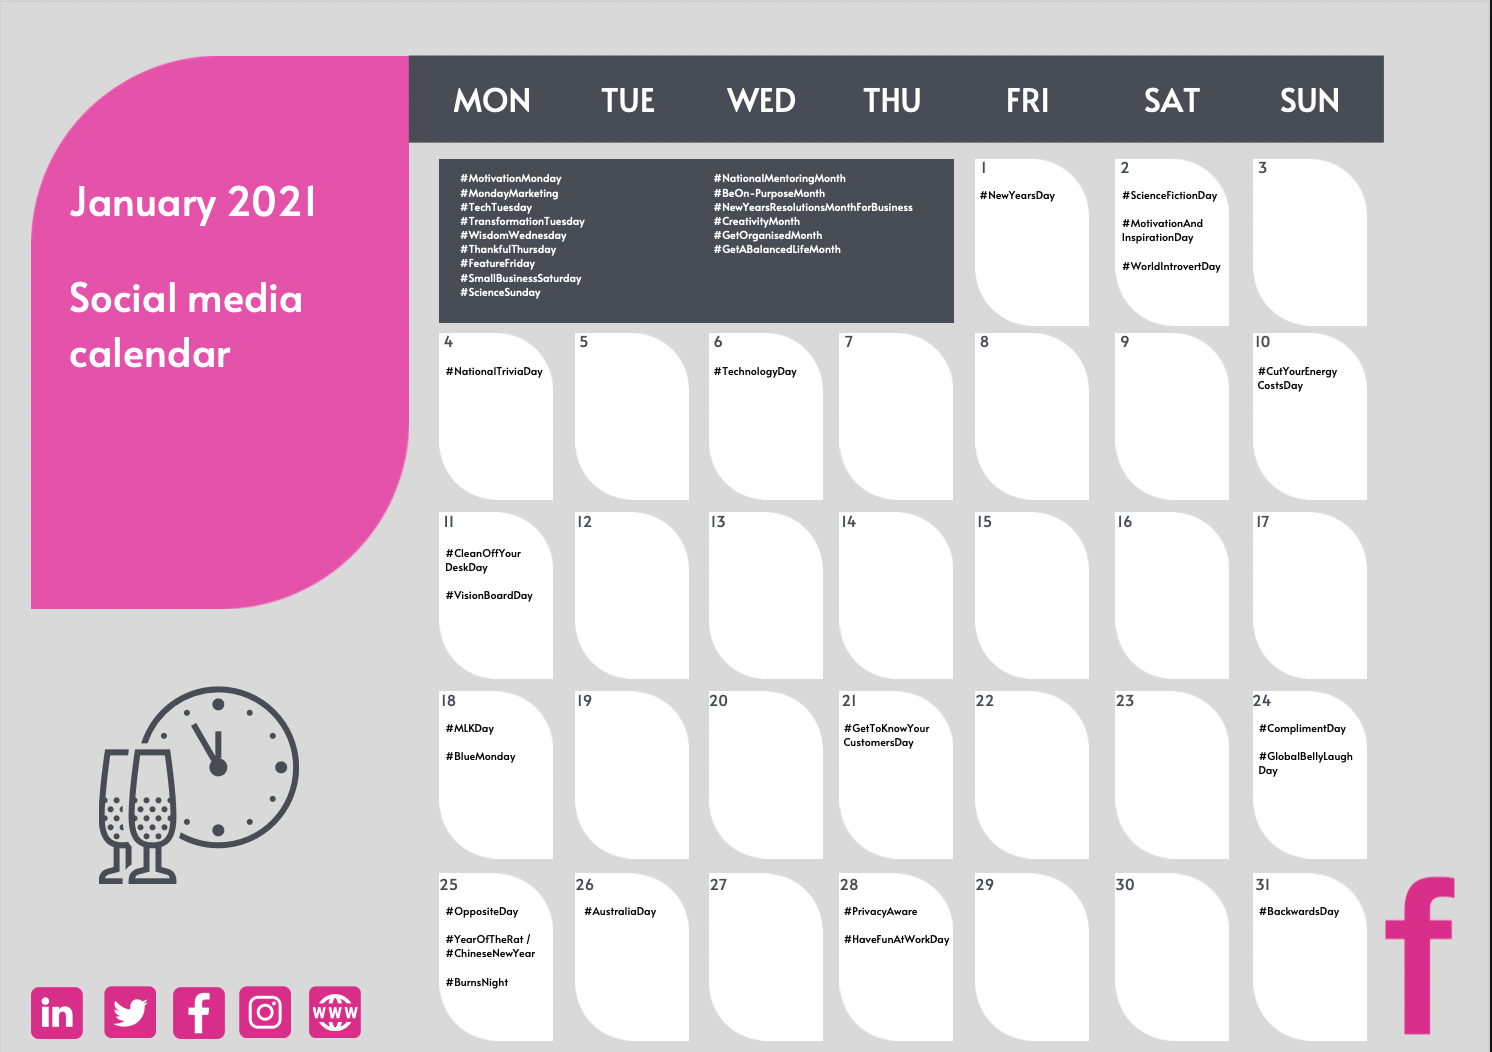 January 2021 social calendar